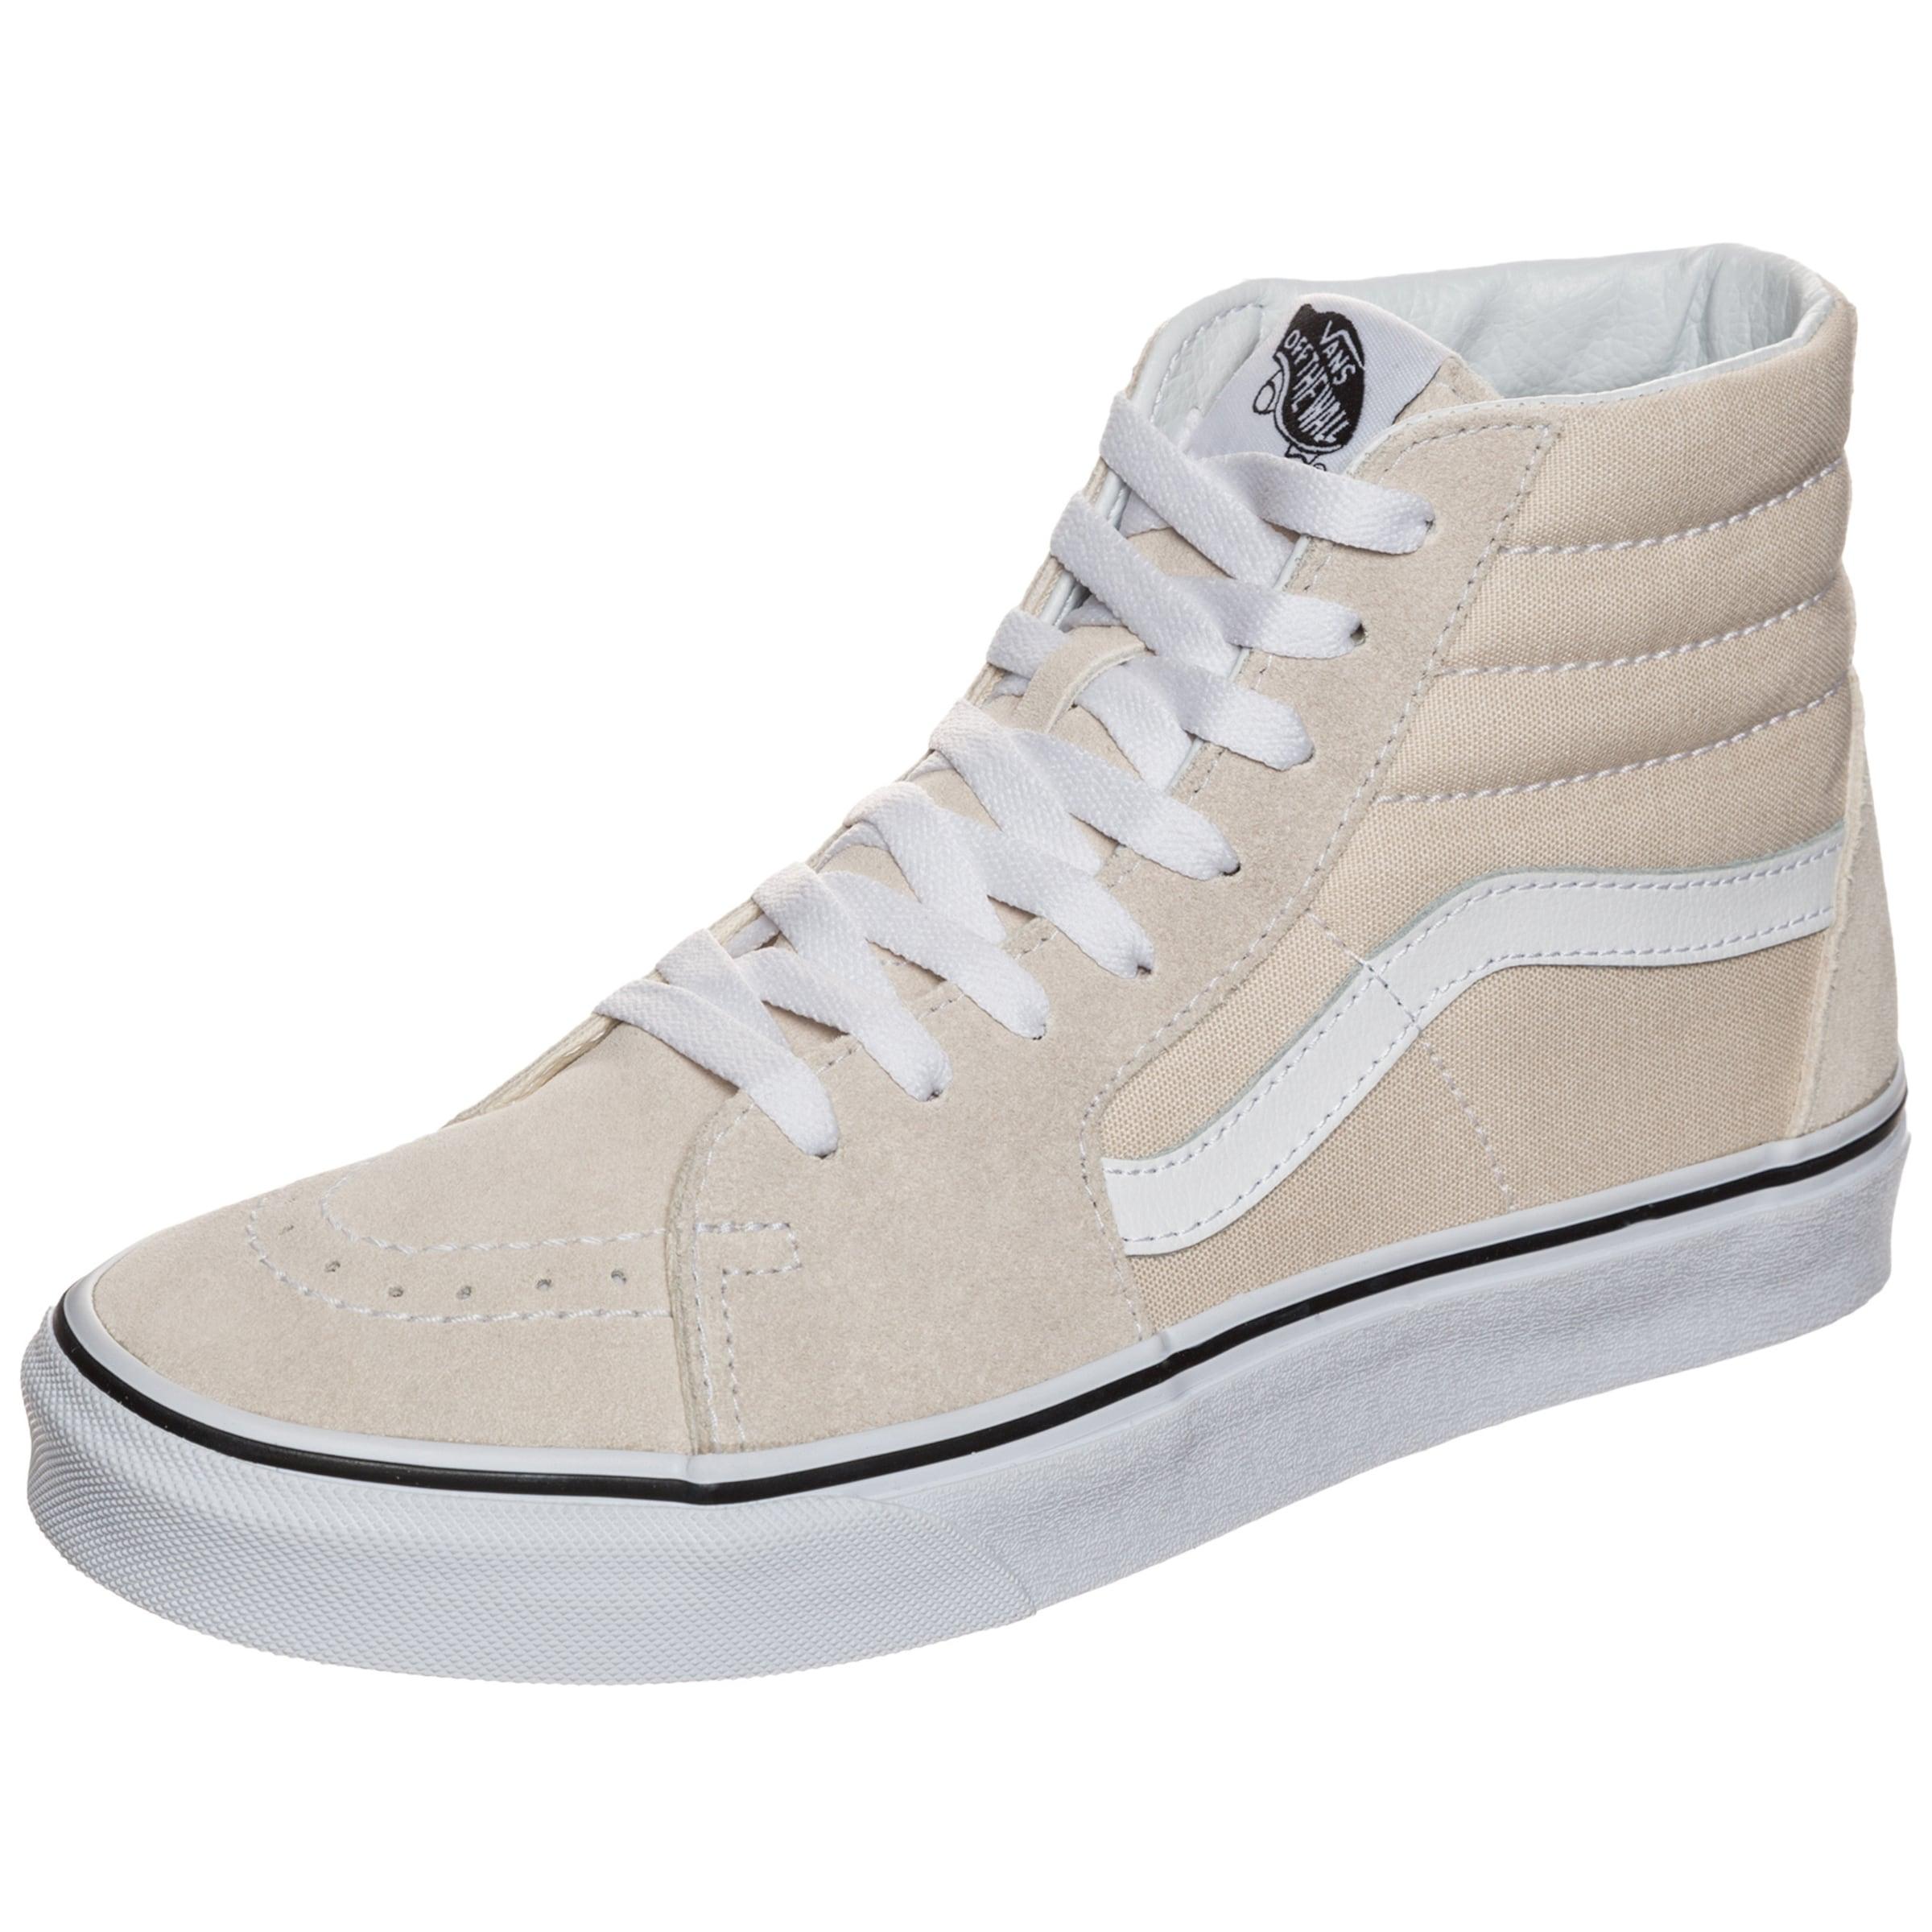 VANS 'Sk8-Hi' Slim Sneaker Finden Große Günstig Online Rabatt Browse Steckdose Billig Authentisch Steckdose Modische mCpJUWIZD